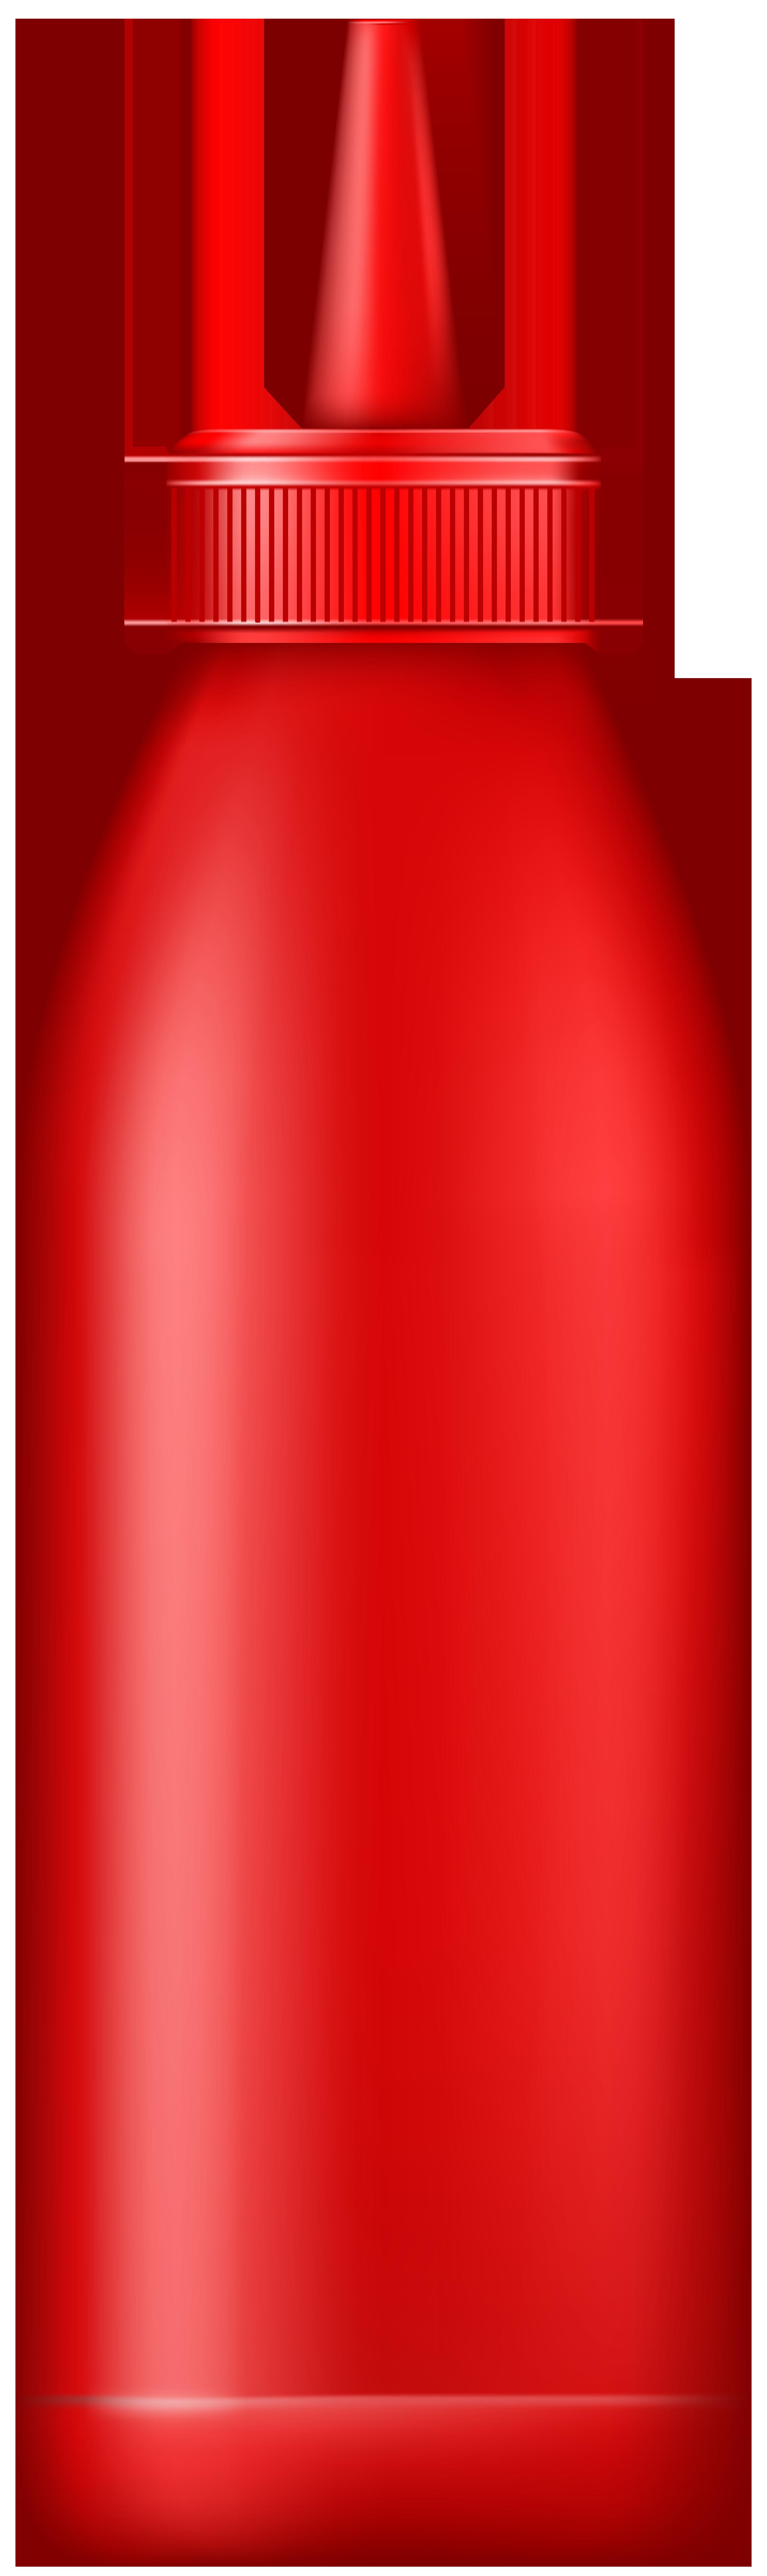 Kids clipart water bottle. Ketchup png clip art